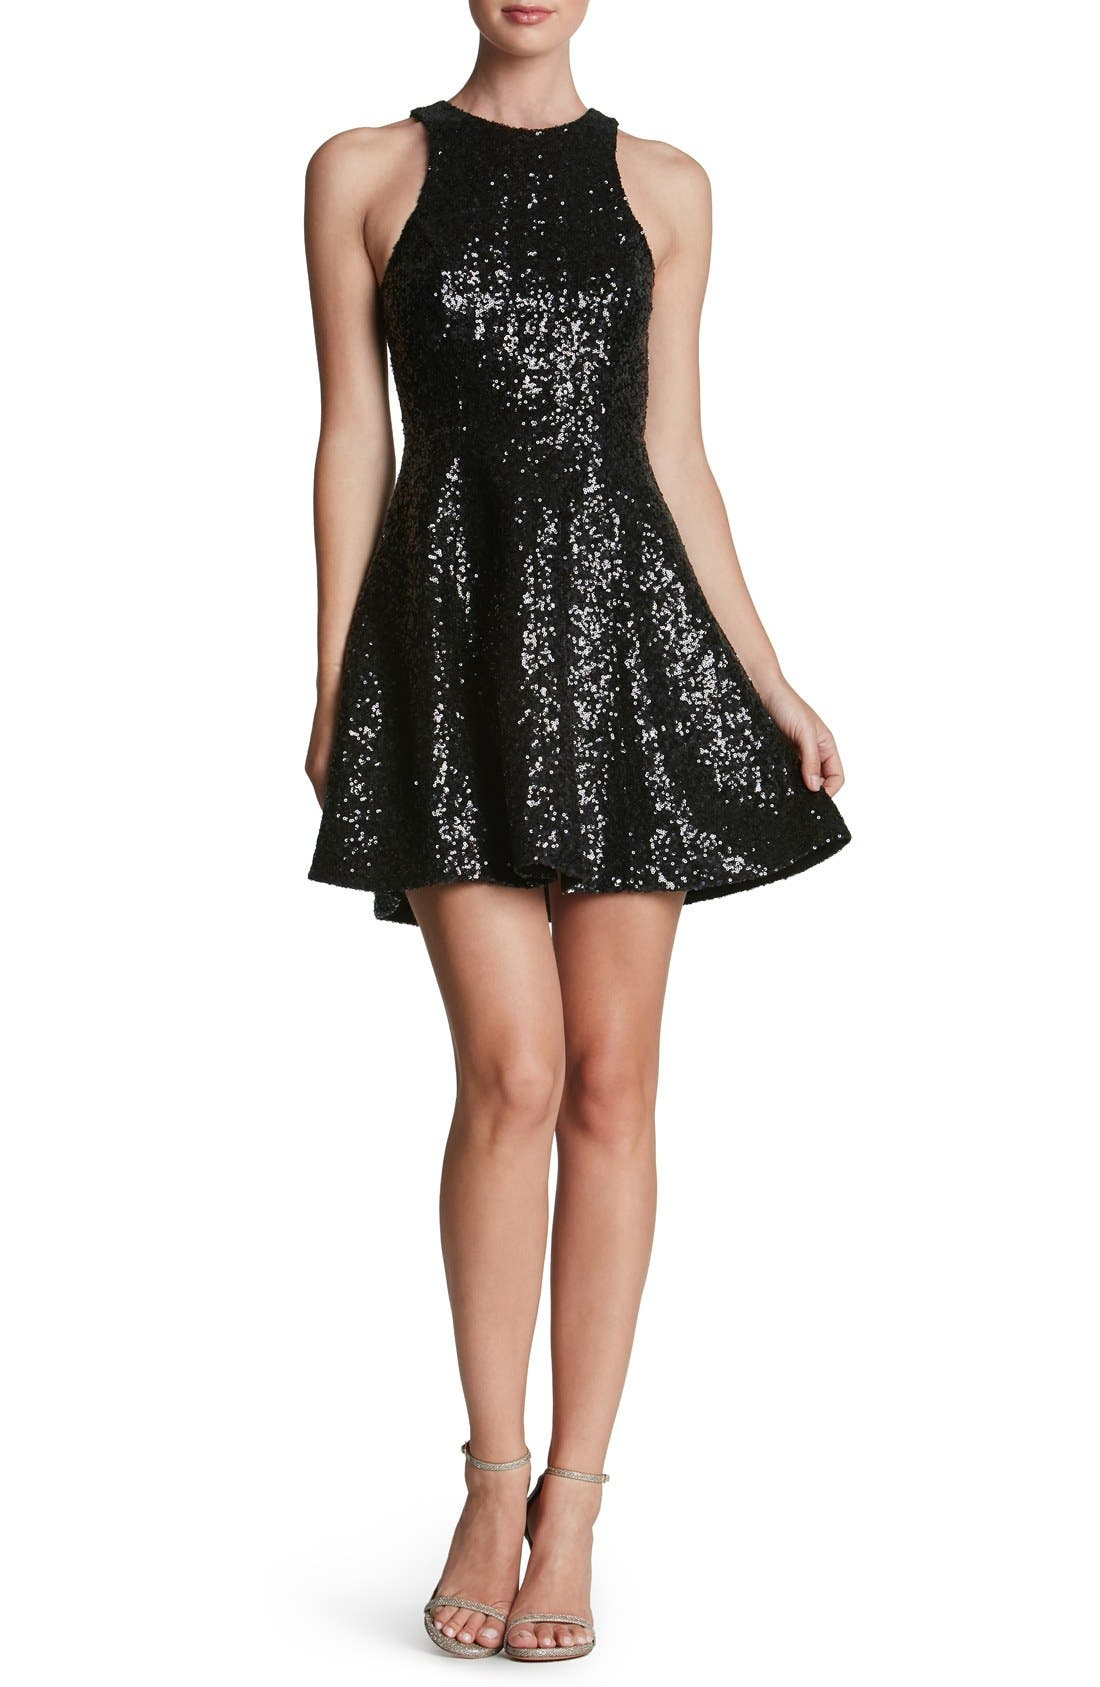 Alternate Image 1 Selected - Dress the Population 'Ginger' Sequin Fit & Flare Dress